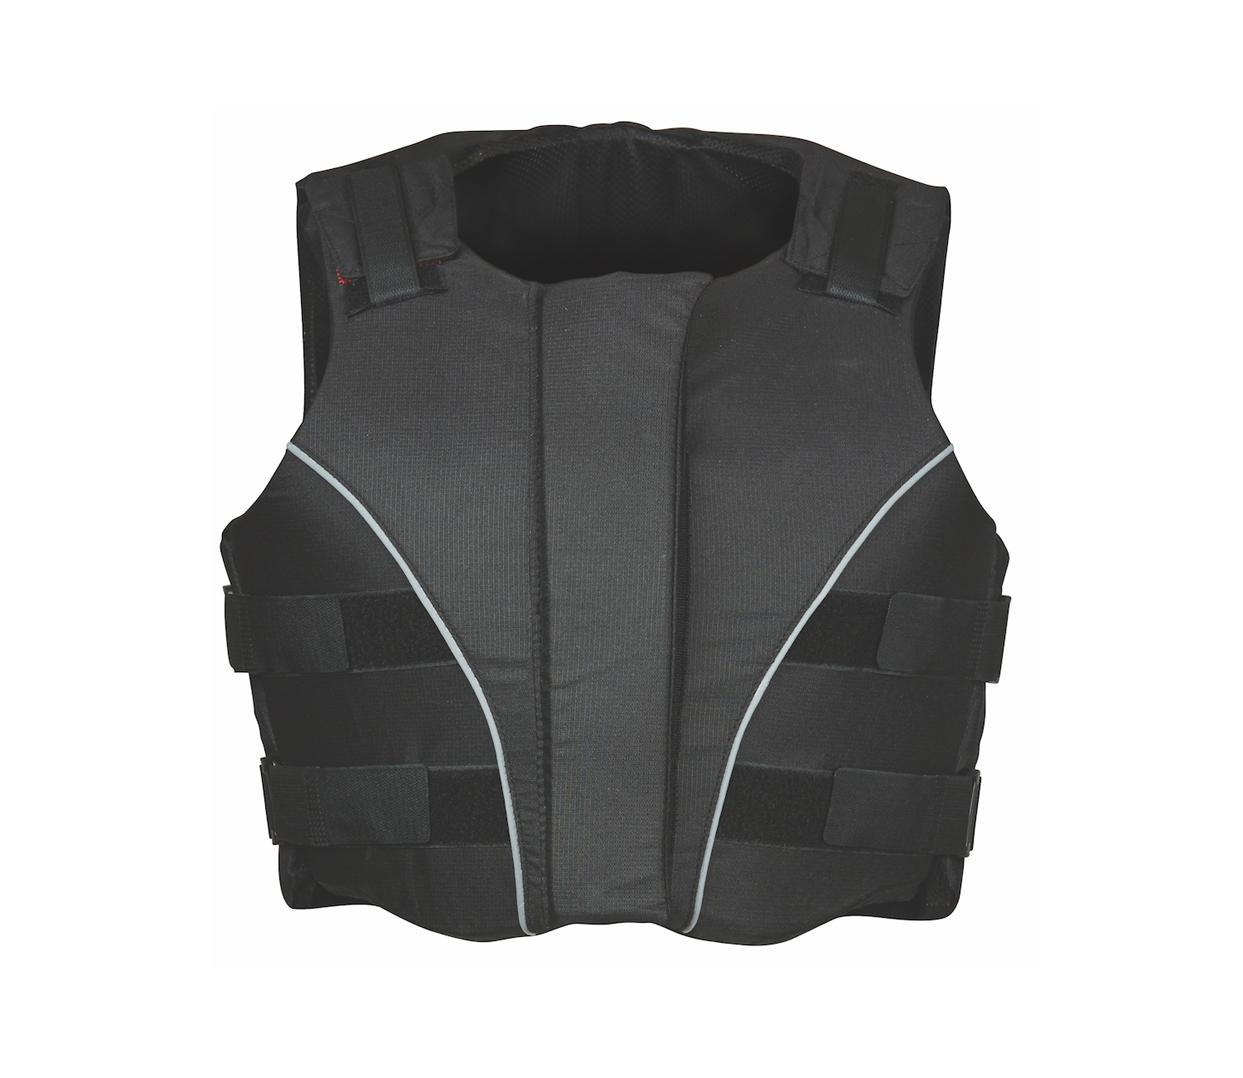 Supra Flex Ez Zip Body Protector